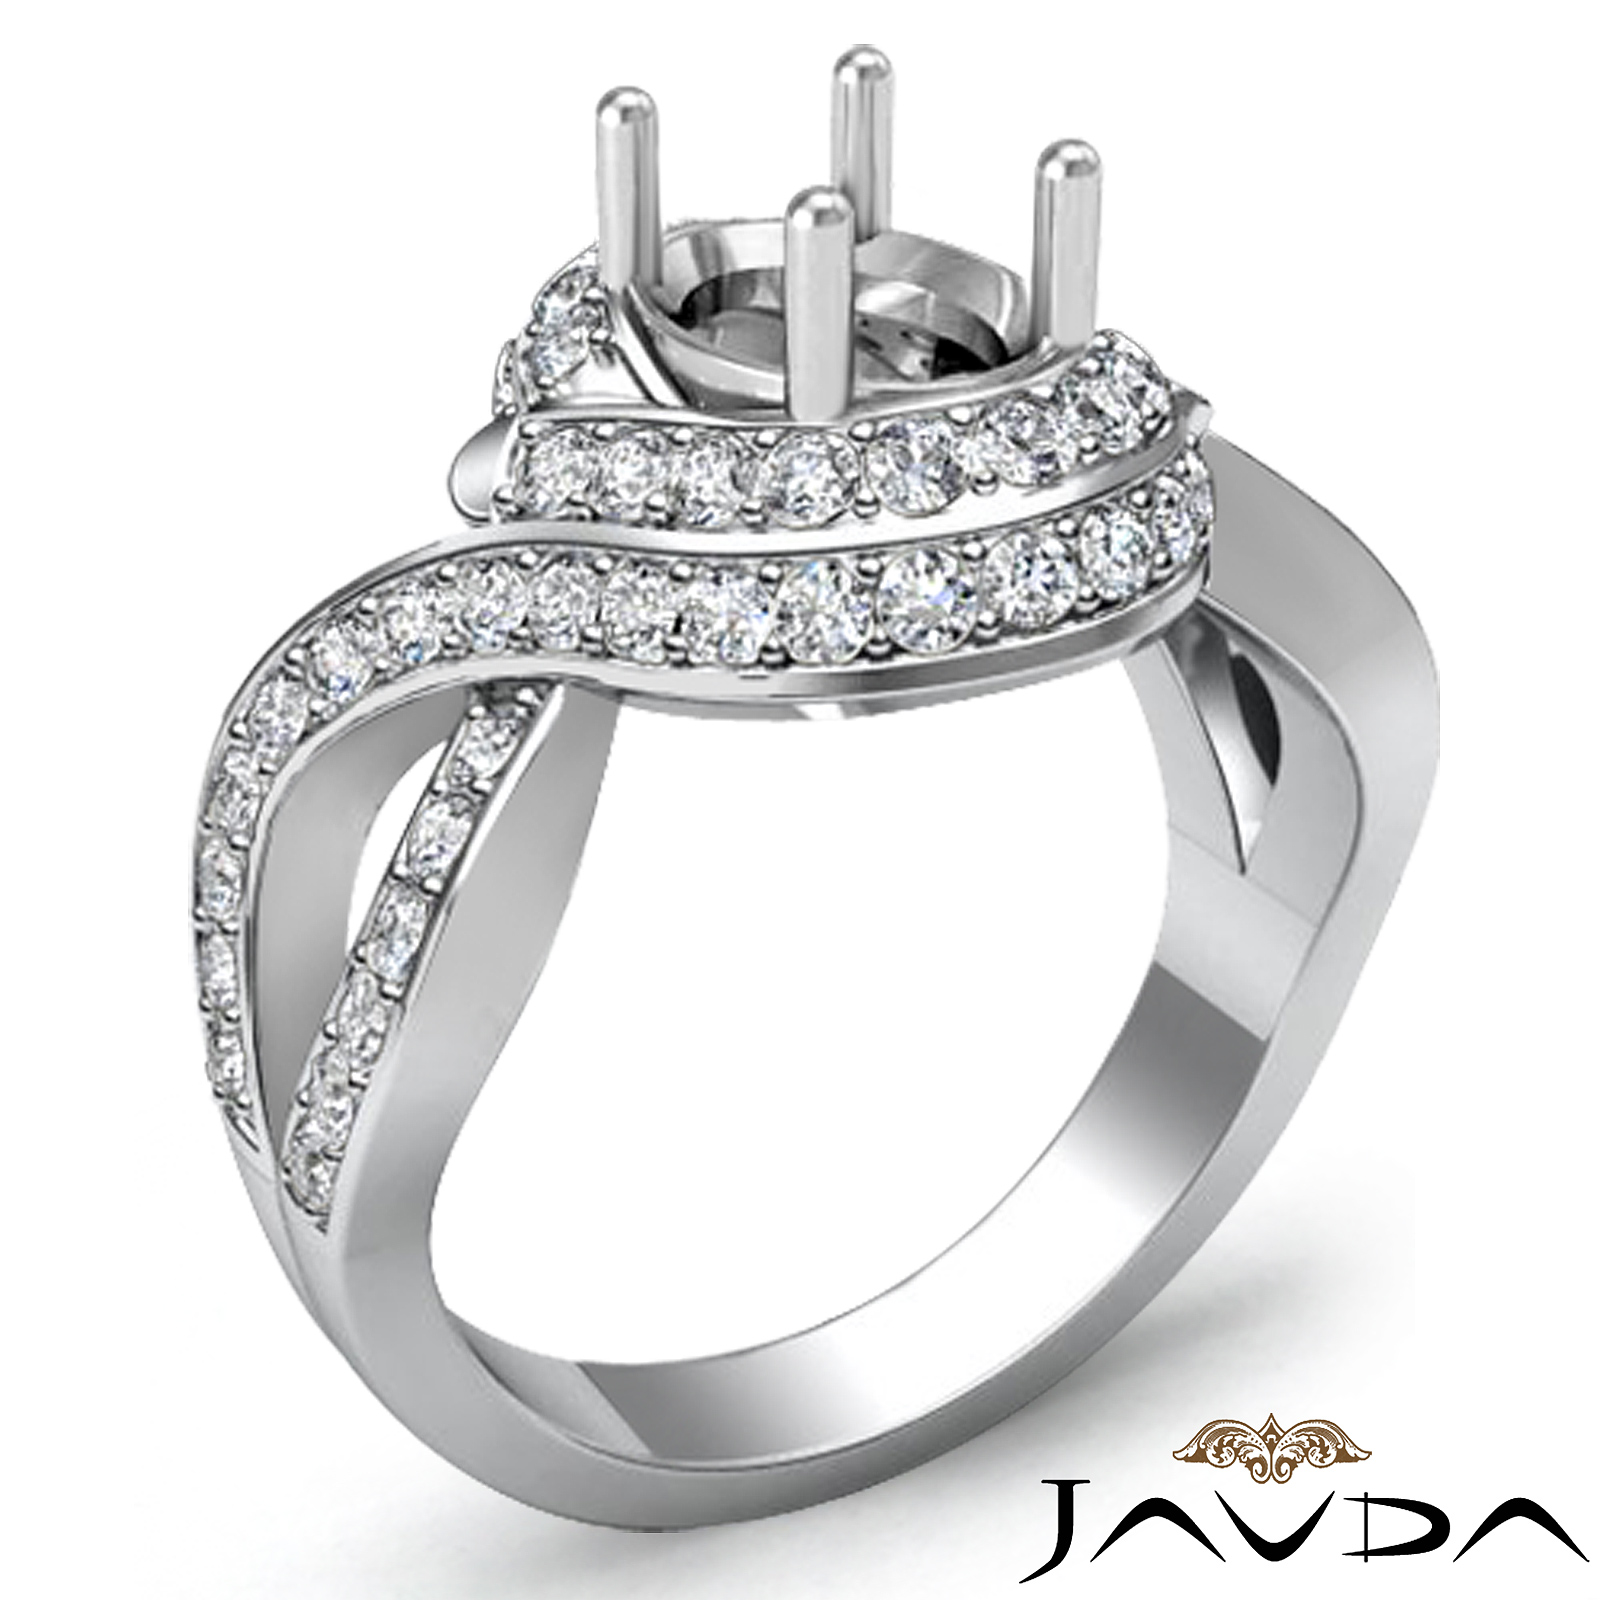 Halo Diamond Engagement Antique Ring Oval Semi Mount Platinum Curve Shank 1Ct